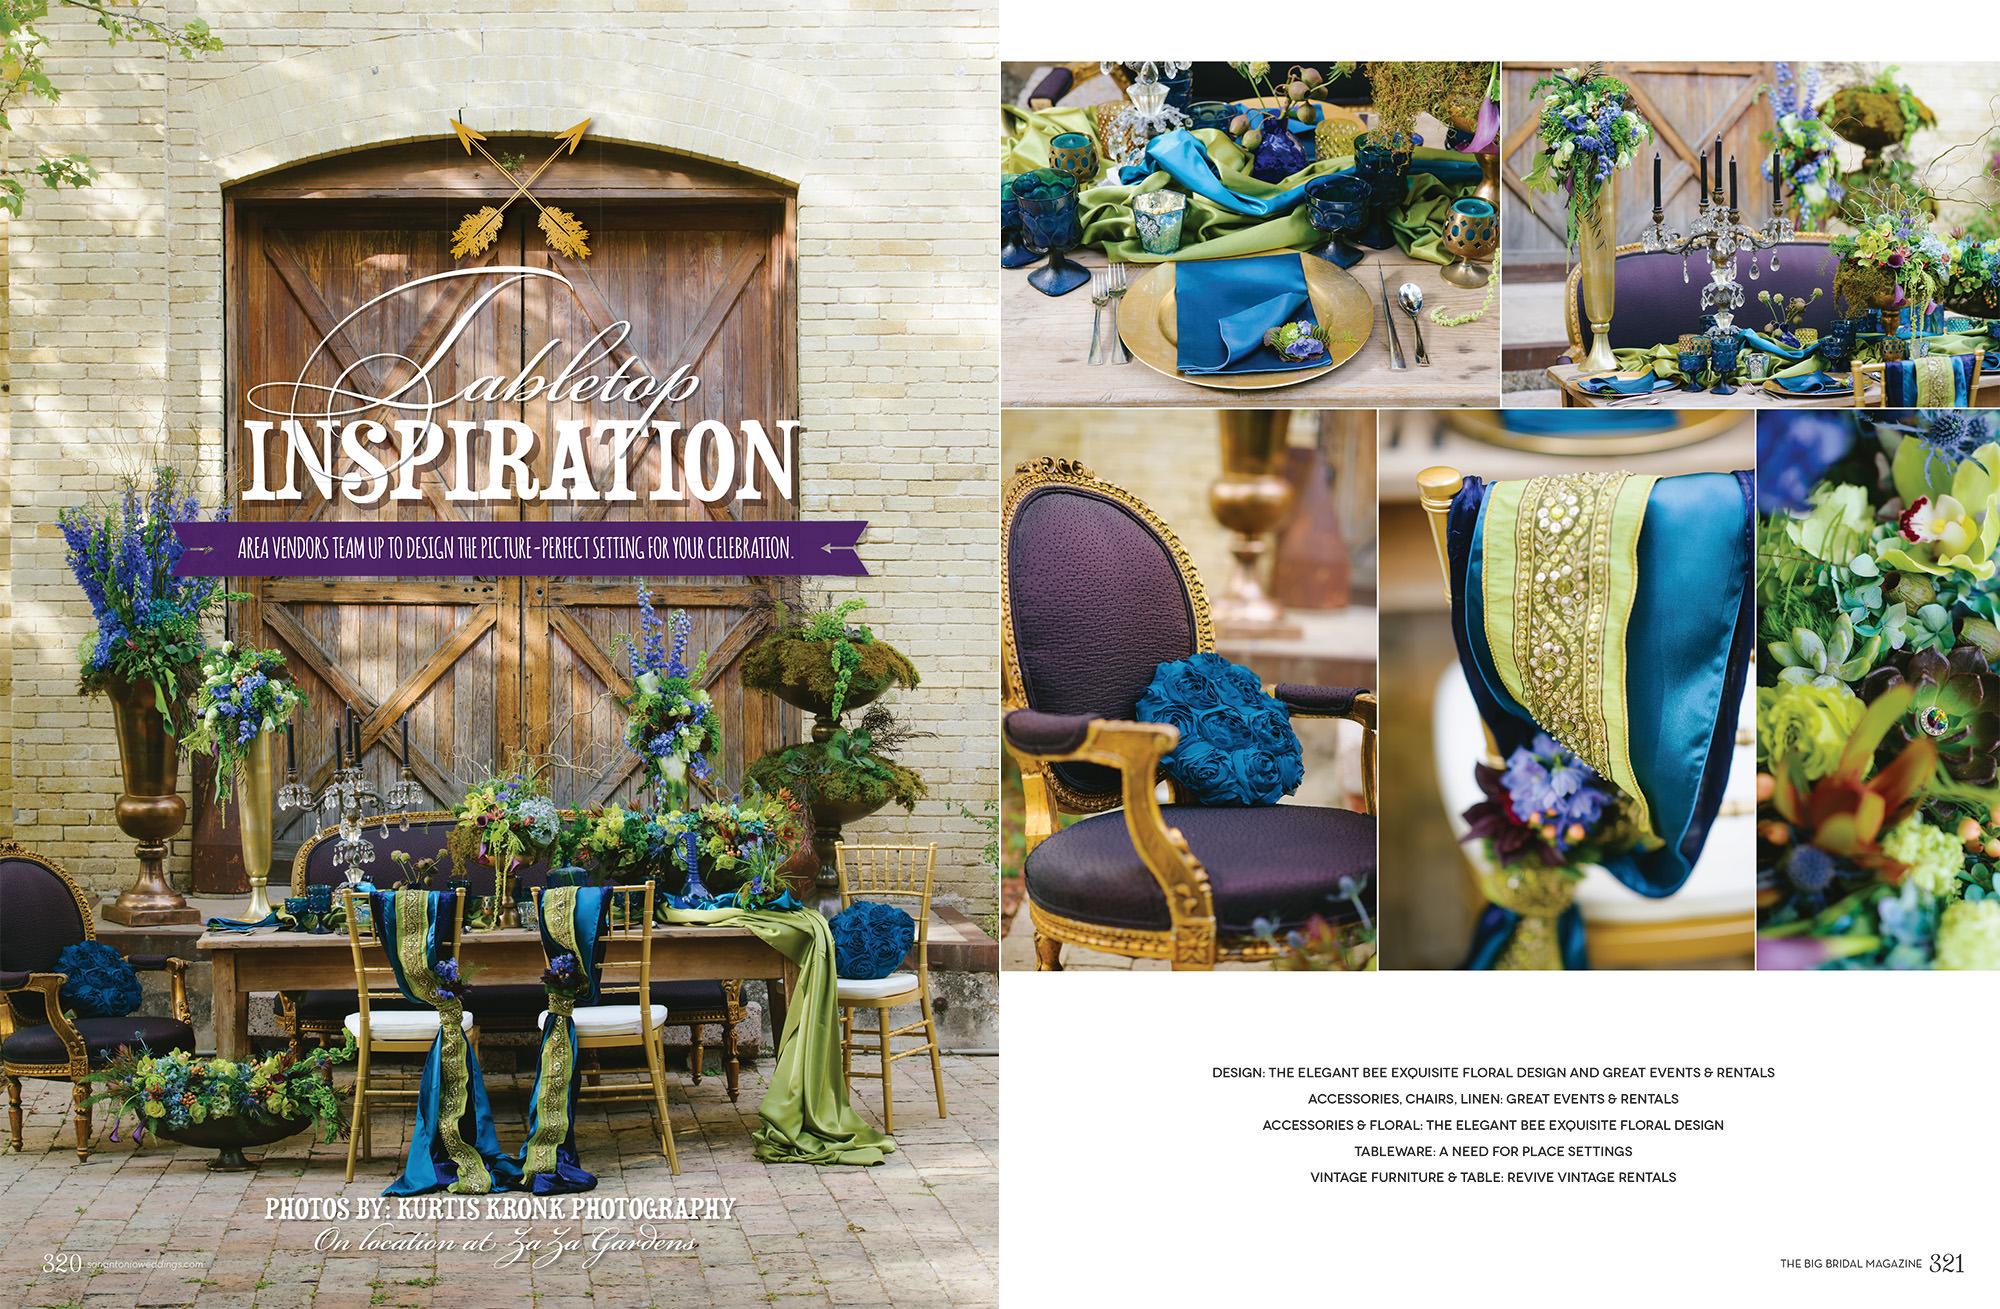 San Antonio Weddings Magazine Feature  (2014, Tabletop Inspiration)